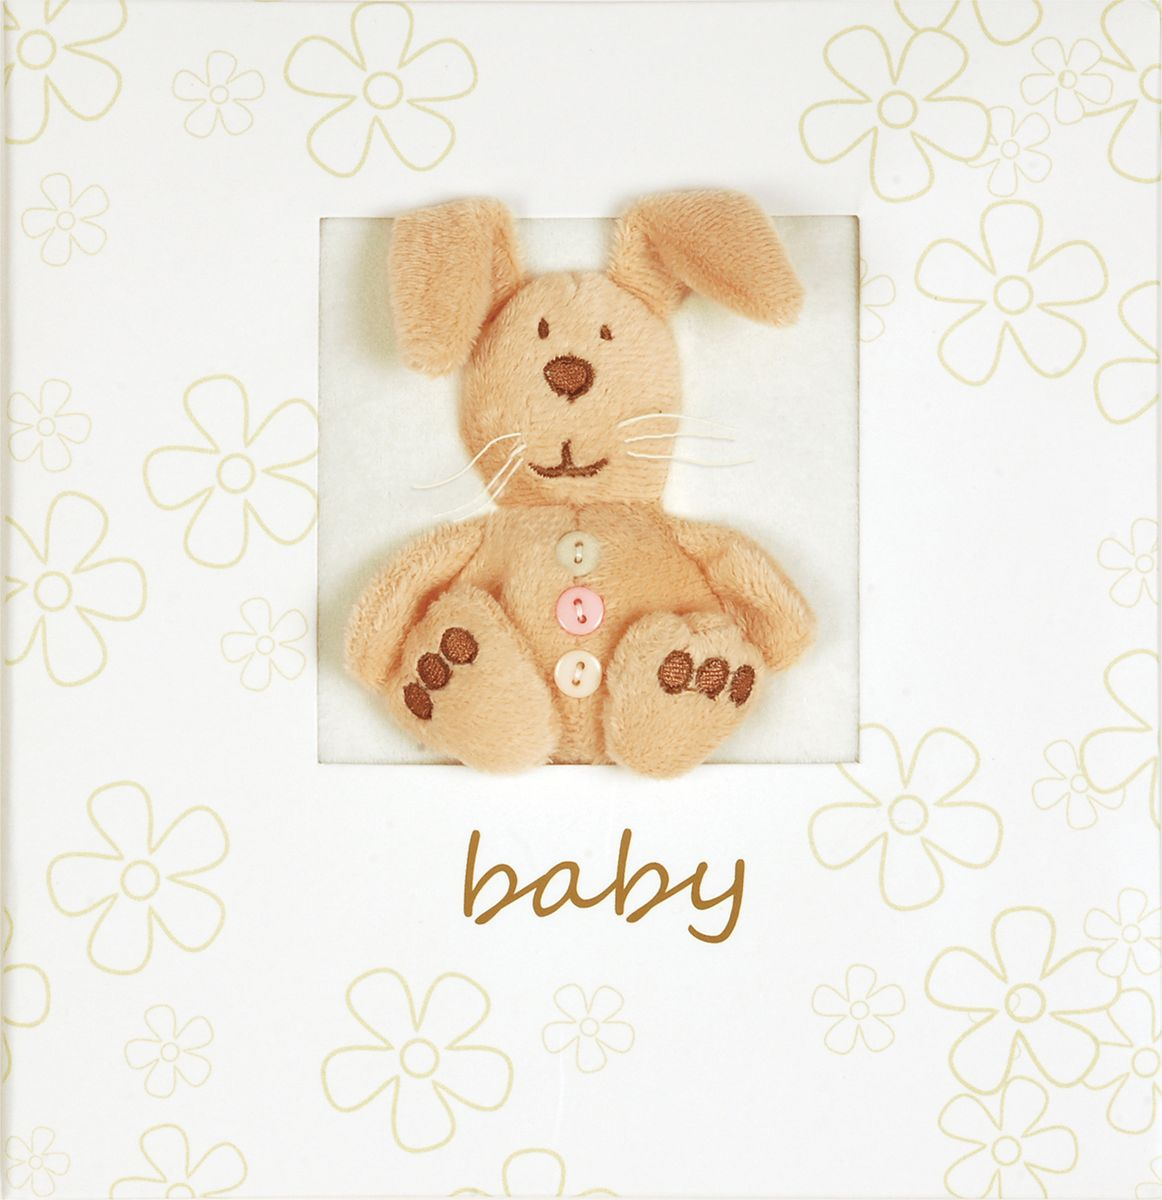 Фотоальбом Innova Plush Baby, цвет: белый, 160 фотографий, 10 x 15 см